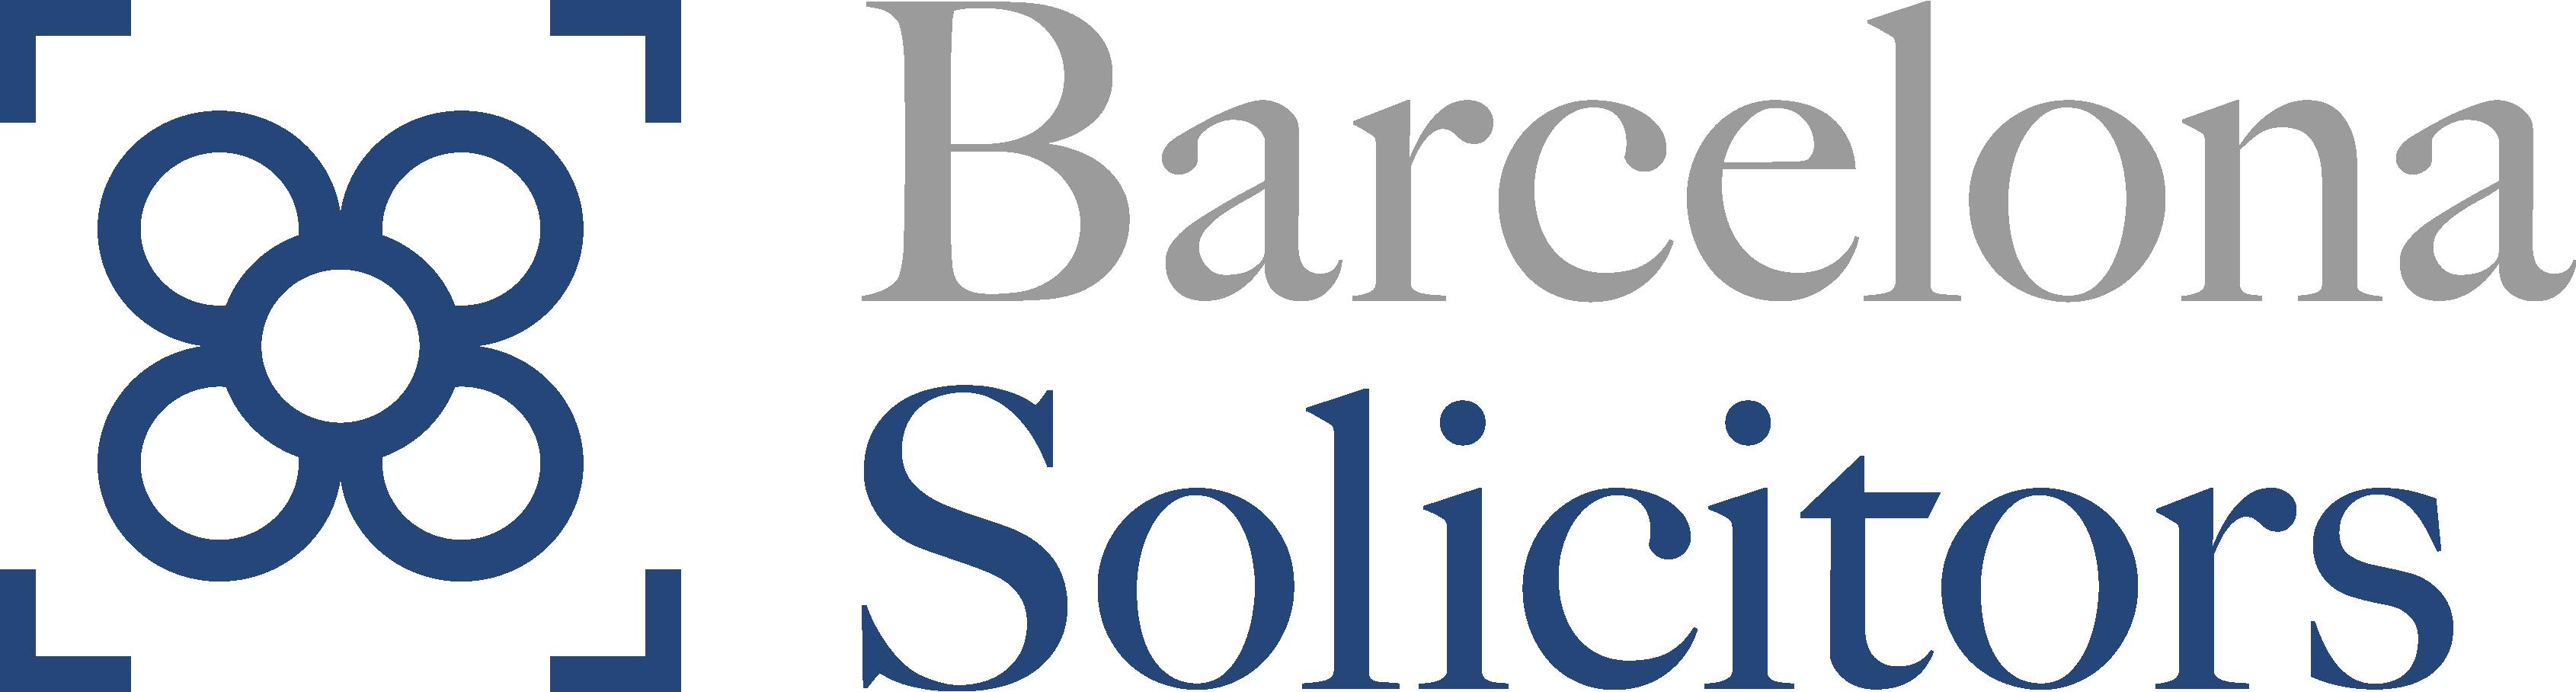 Barcelona Solicitors logo 1